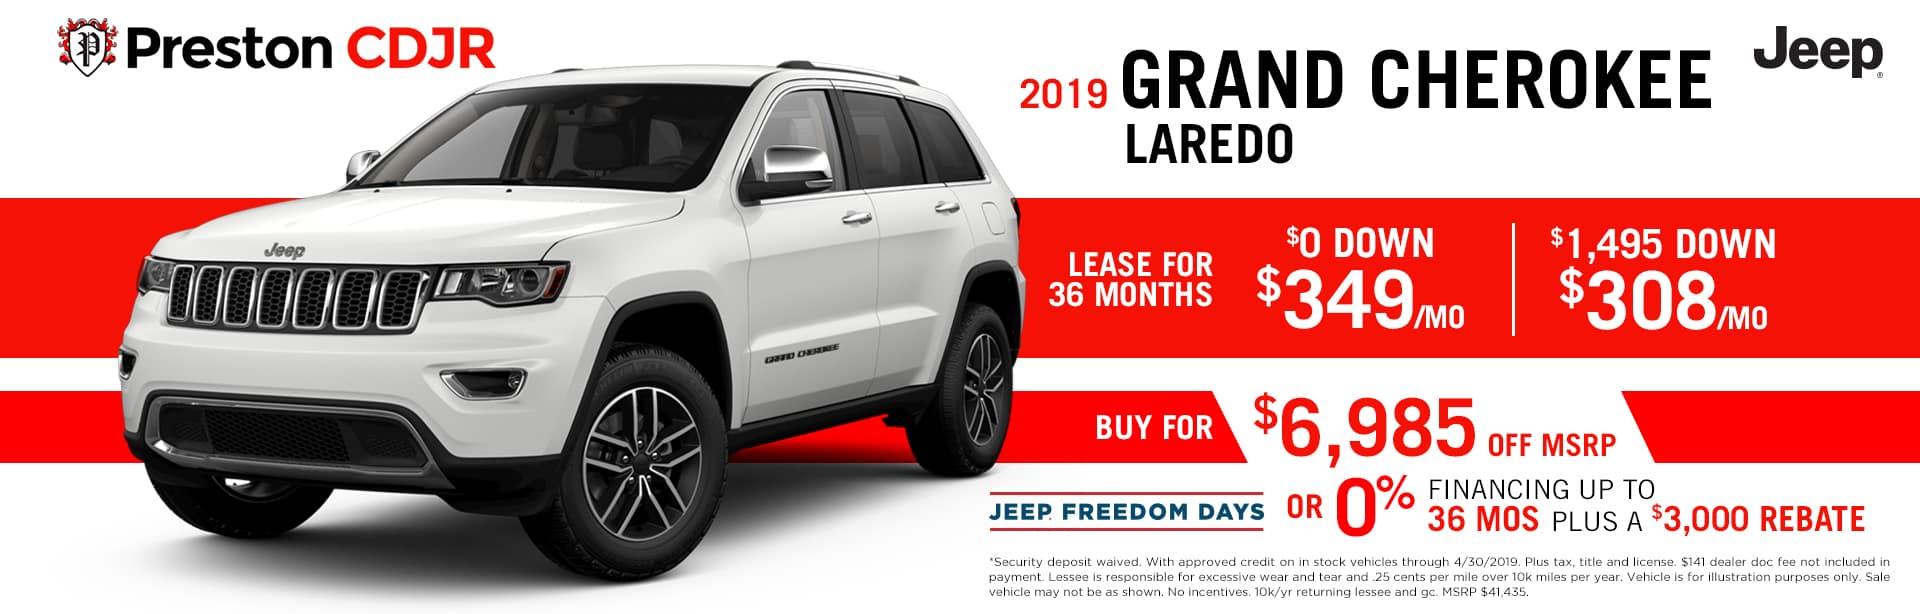 deal grand cherokee laredo